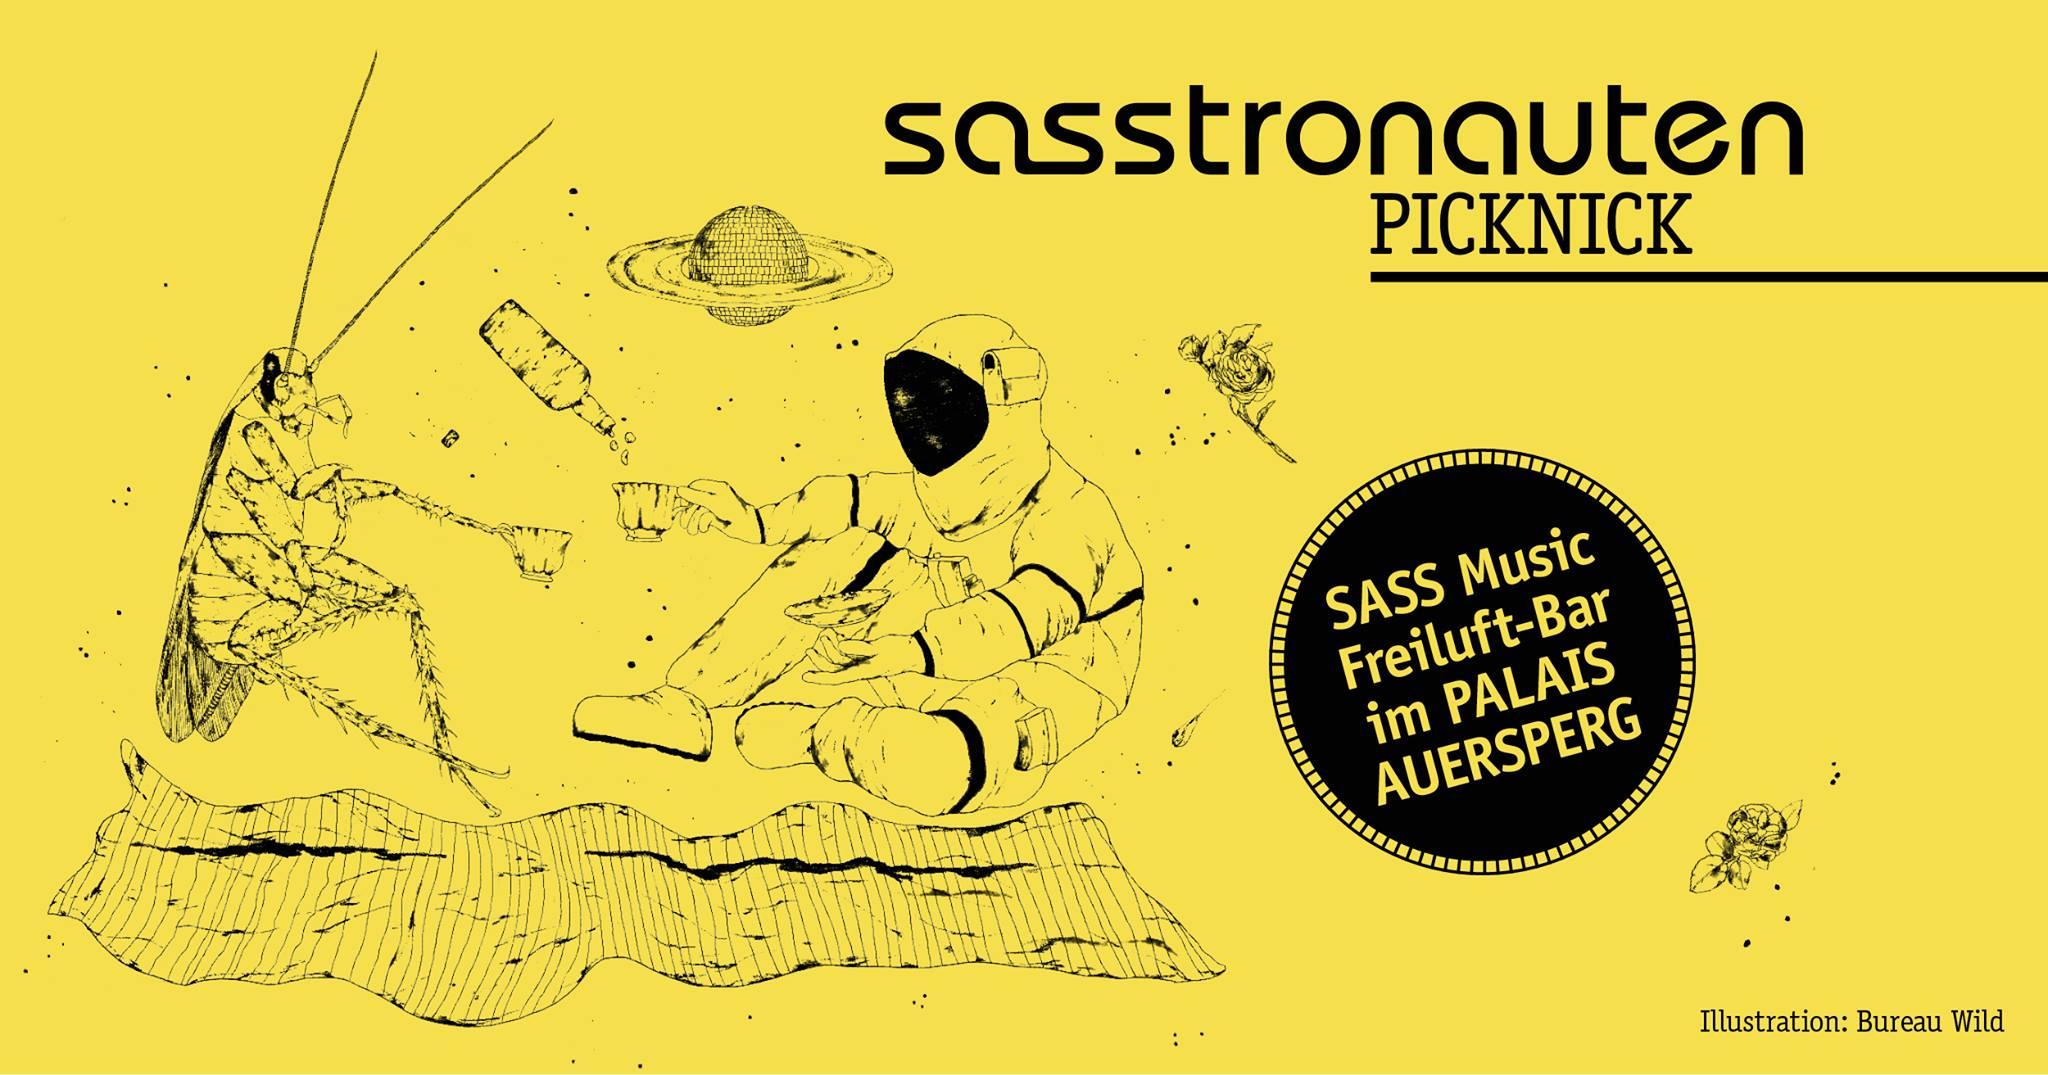 Events Wien: #sasstronautenpicknick im Palais Auersperg